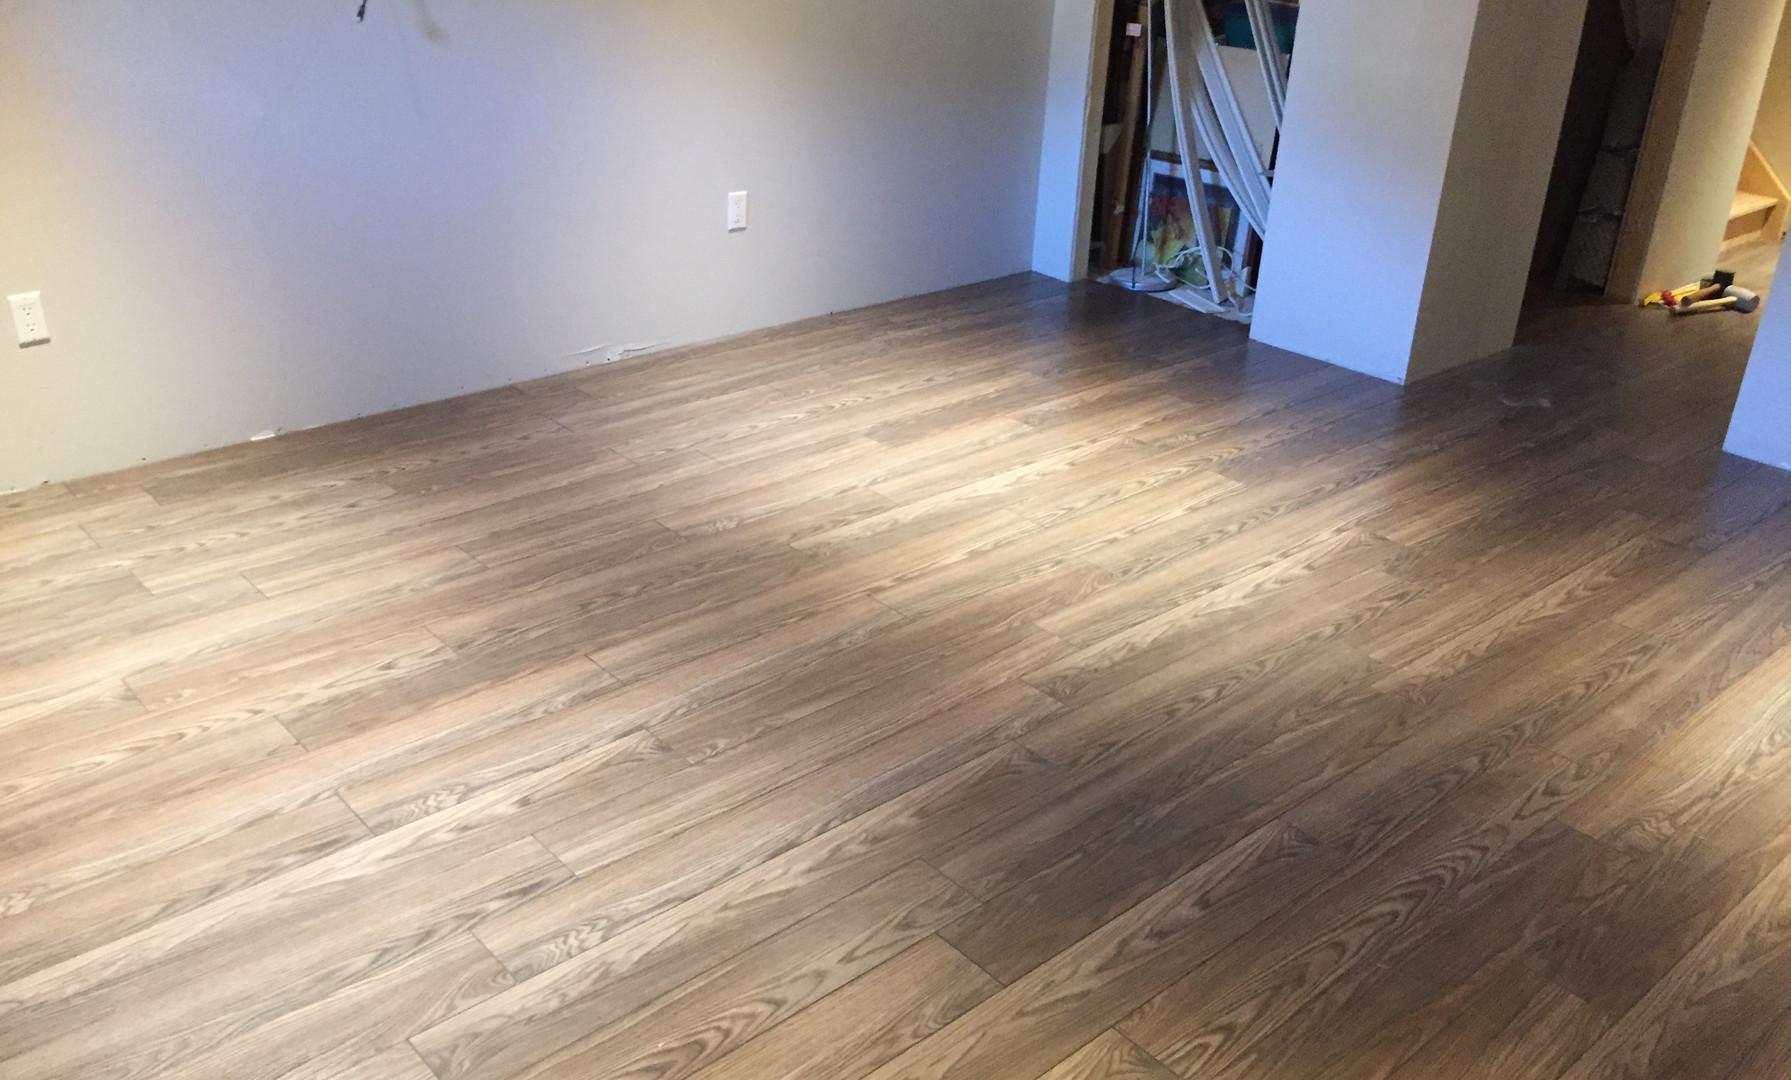 Jonesridge Basement Flooring (2/2)